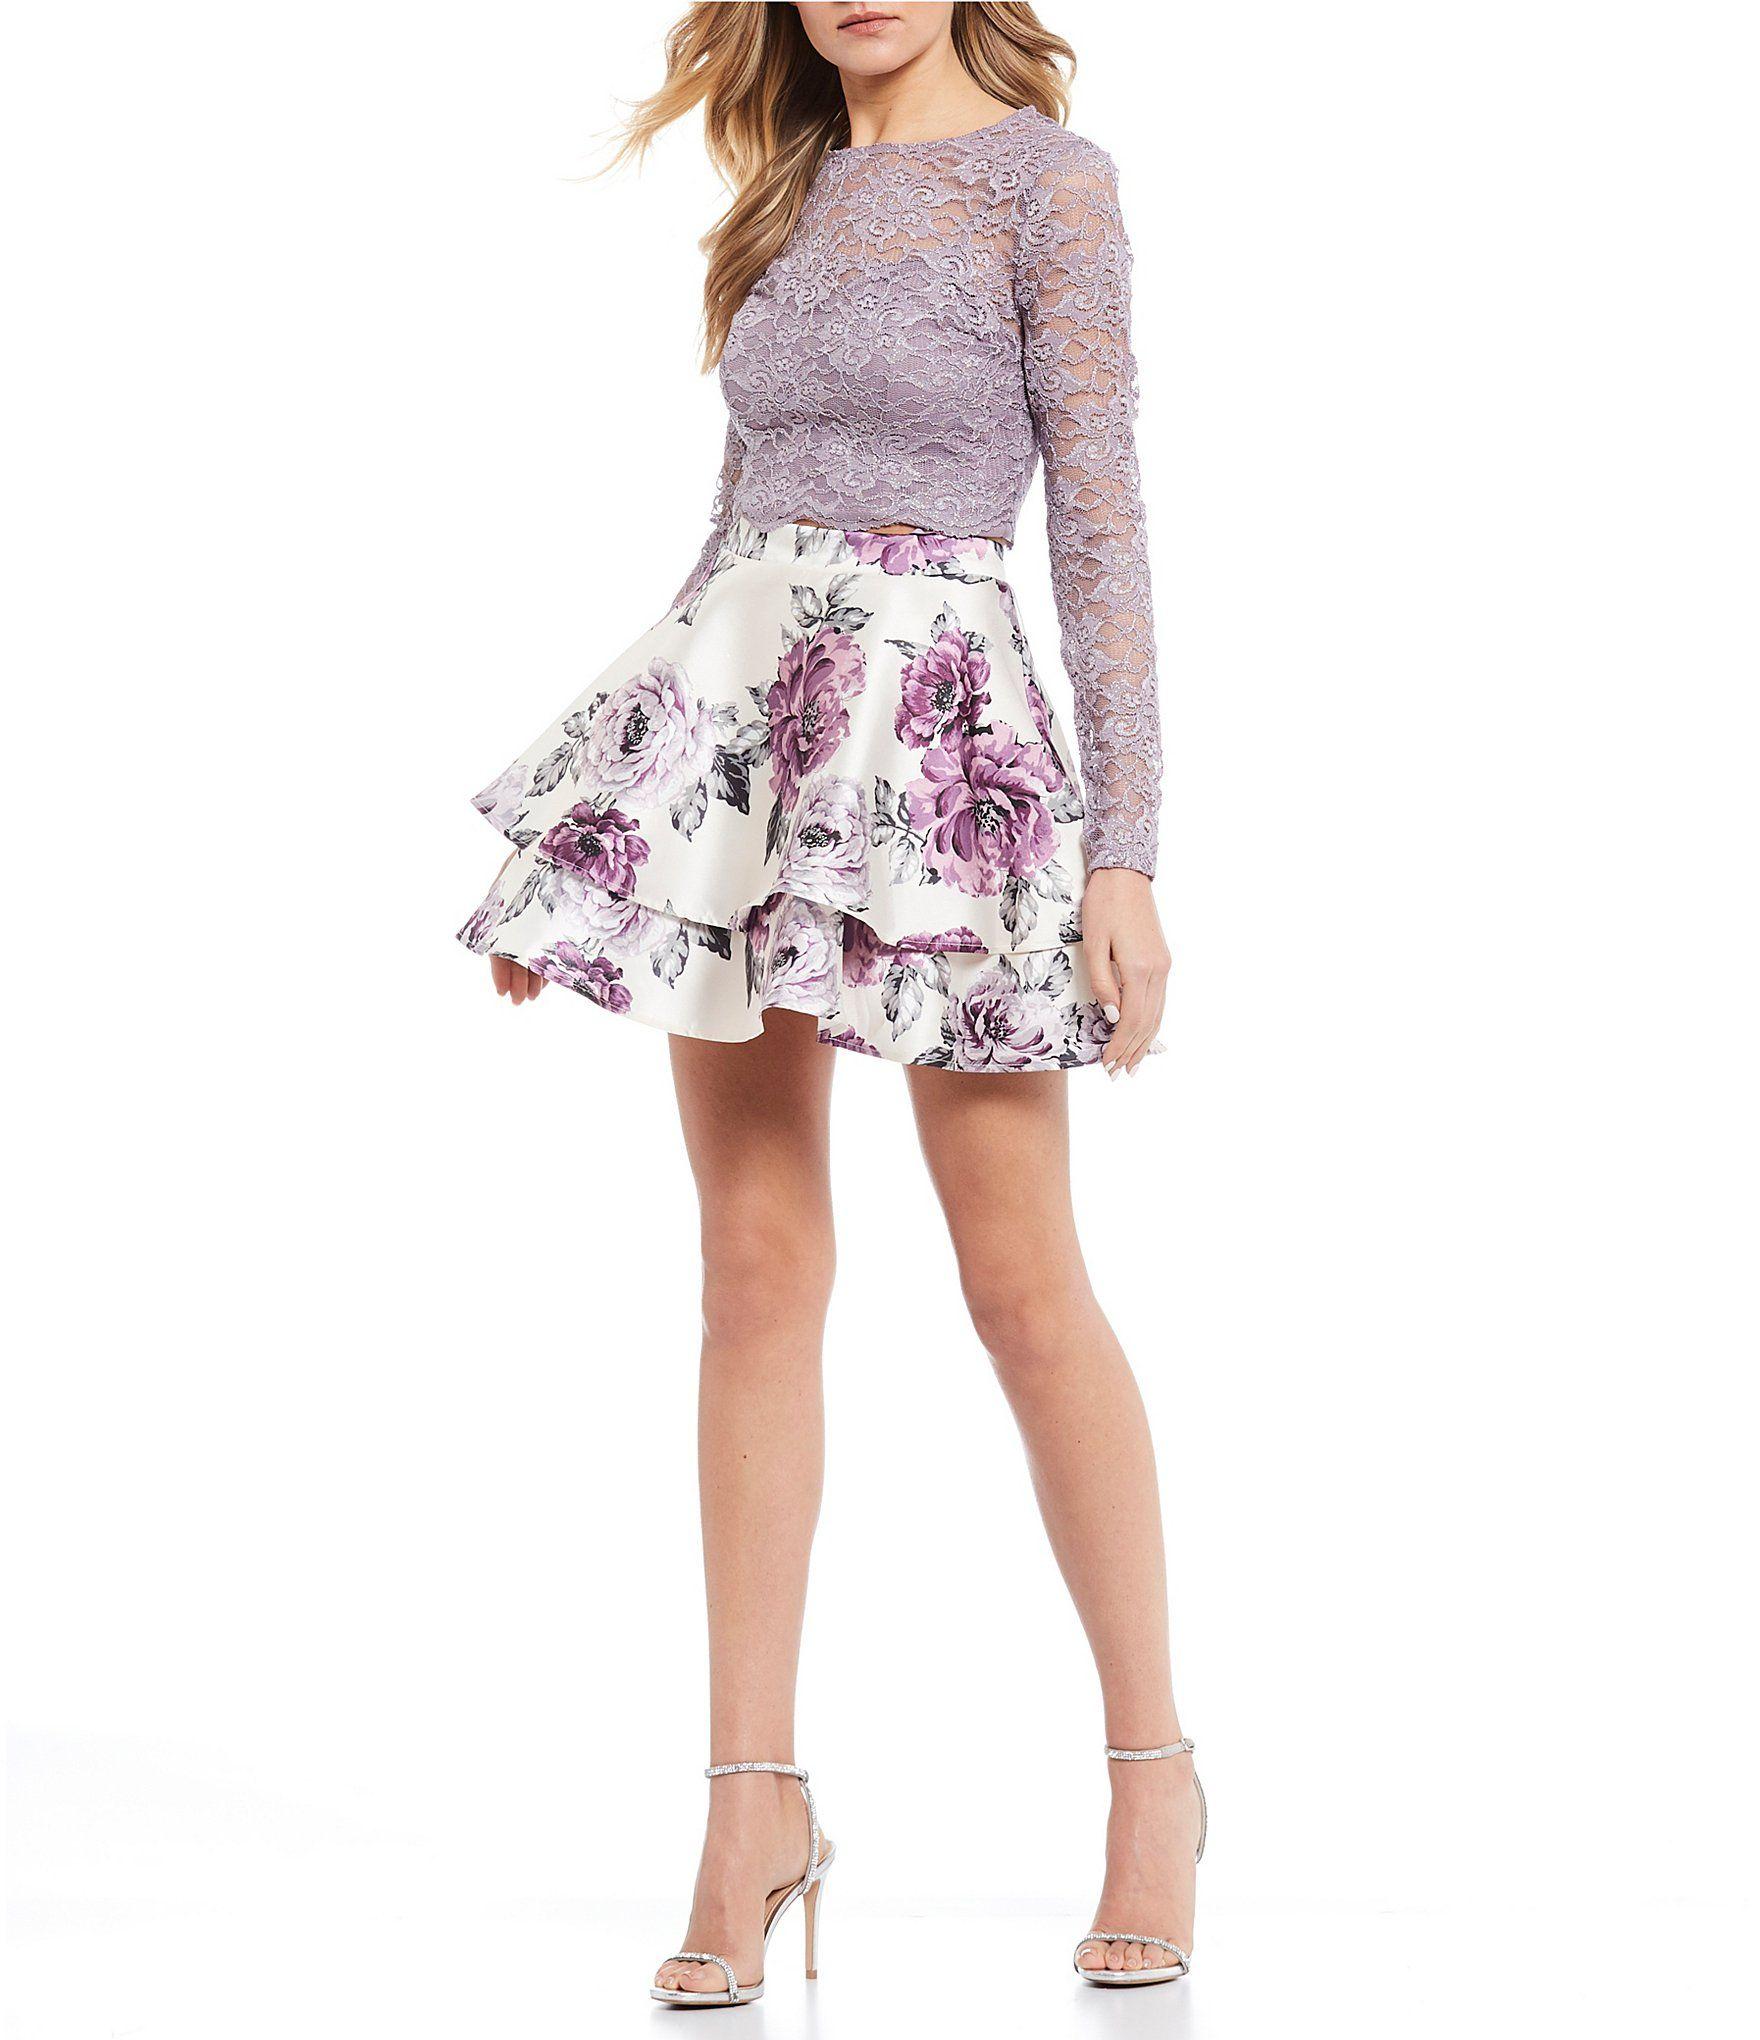 Pin By Hannah Sherer On Dresses Cute Long Sleeve Dresses Lace Top Long Sleeve Long Sleeve Dress [ 2040 x 1760 Pixel ]